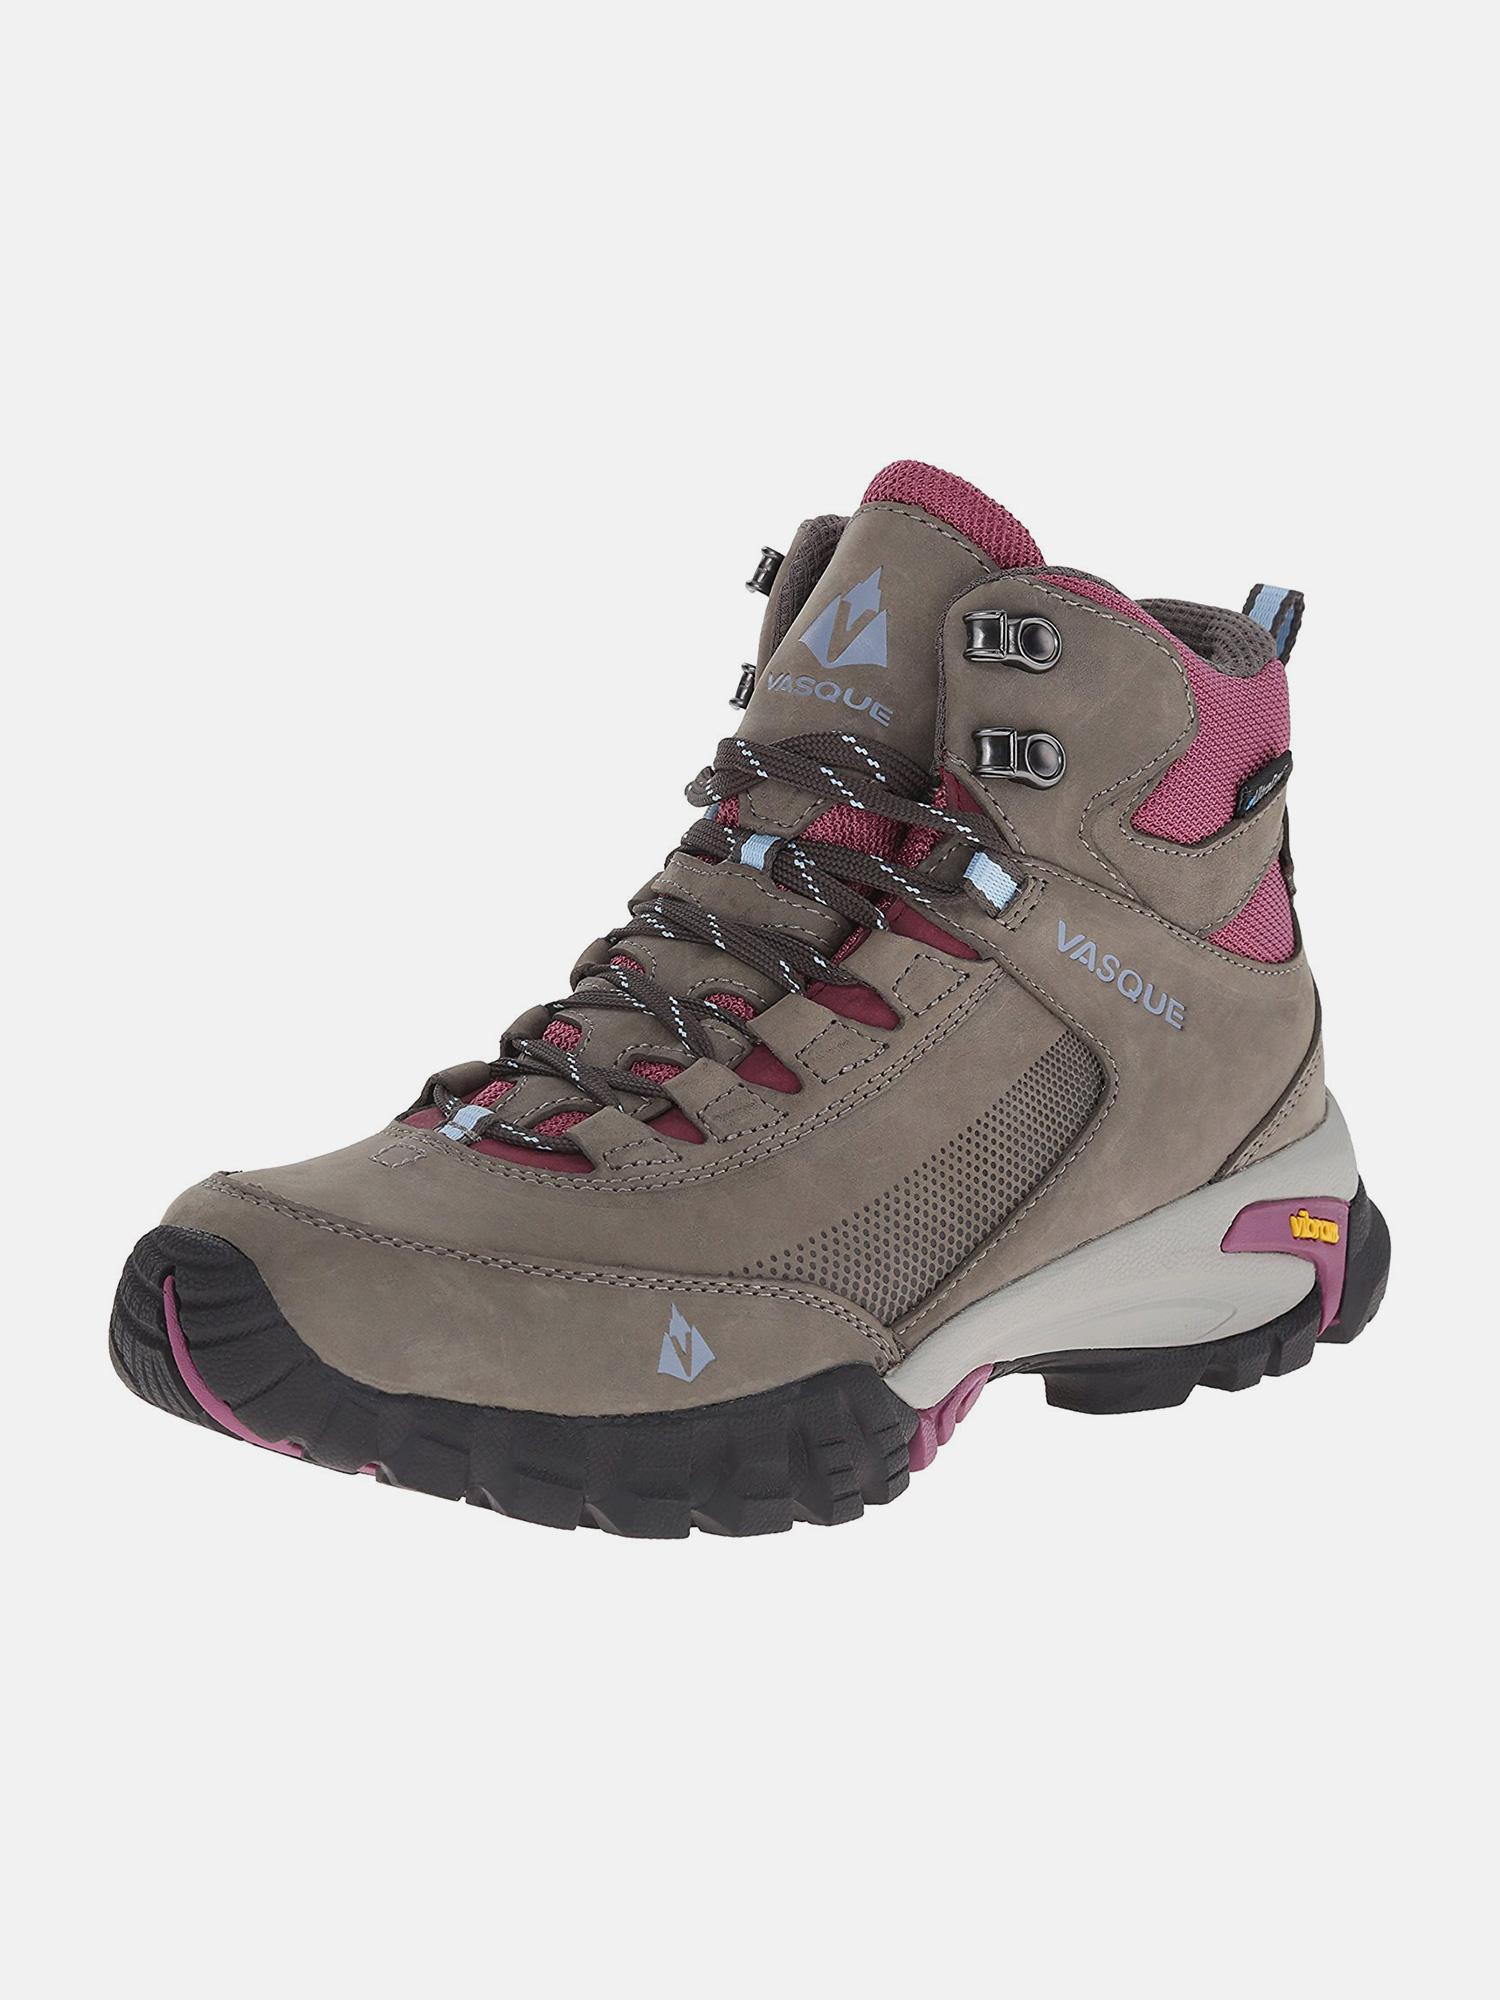 Vasque Hiking Boots - $99